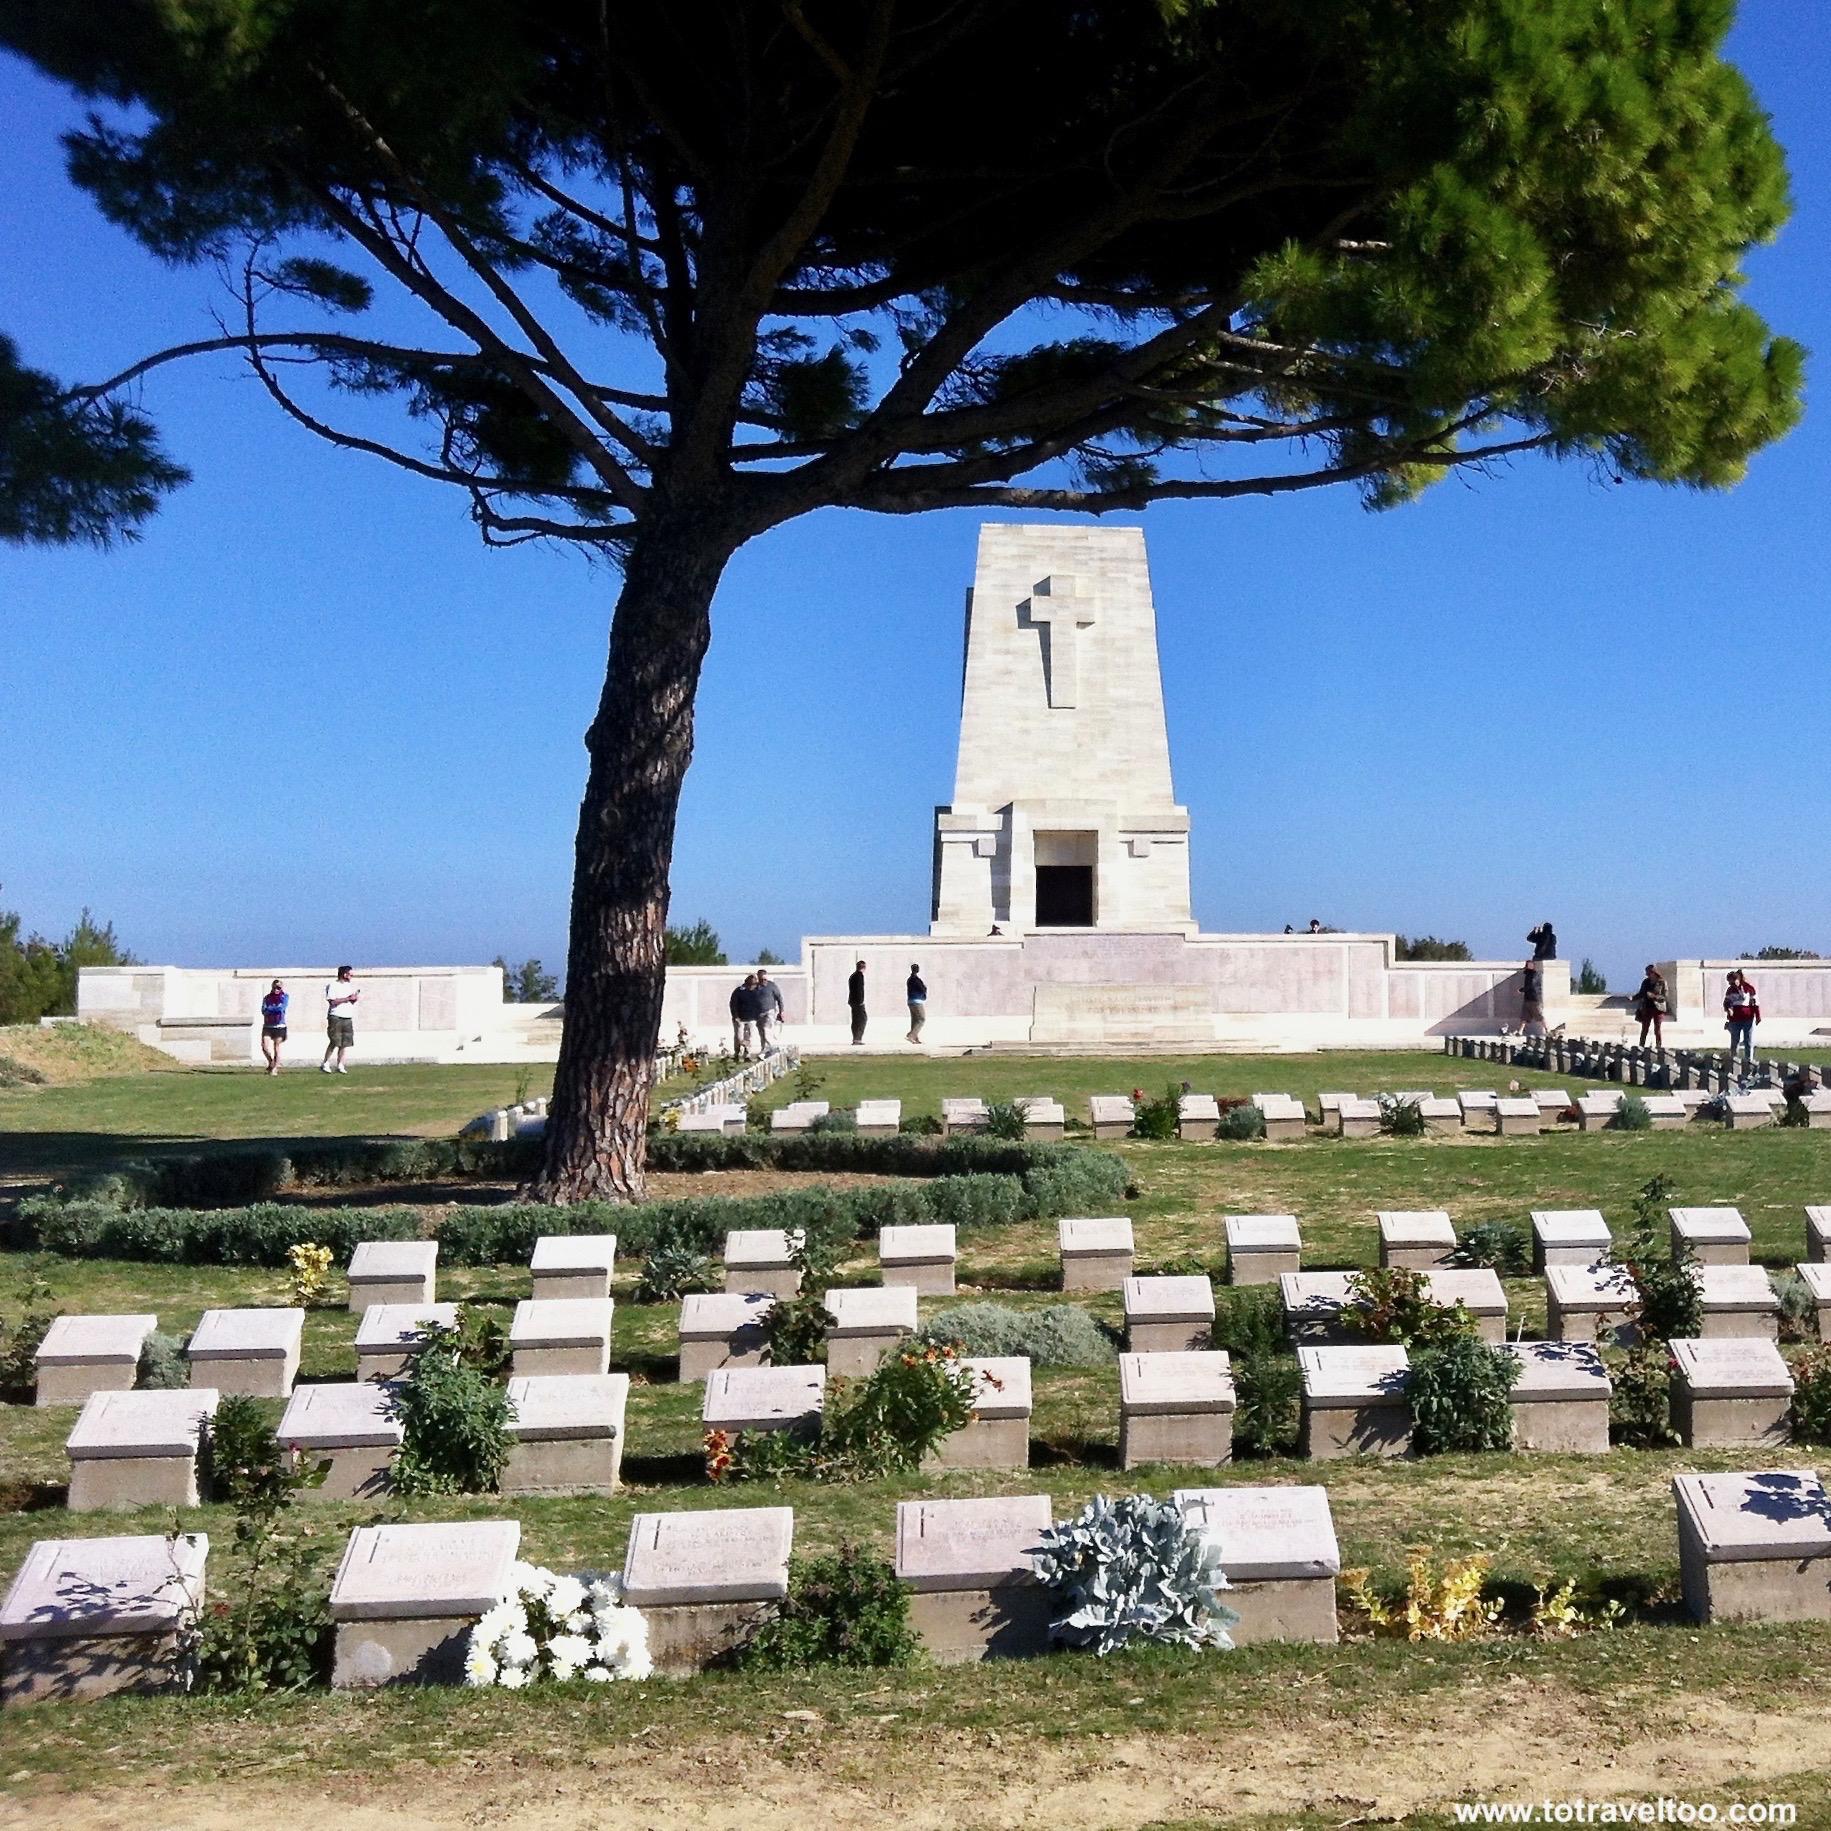 Lone Pine Cemetery at Gallipoli